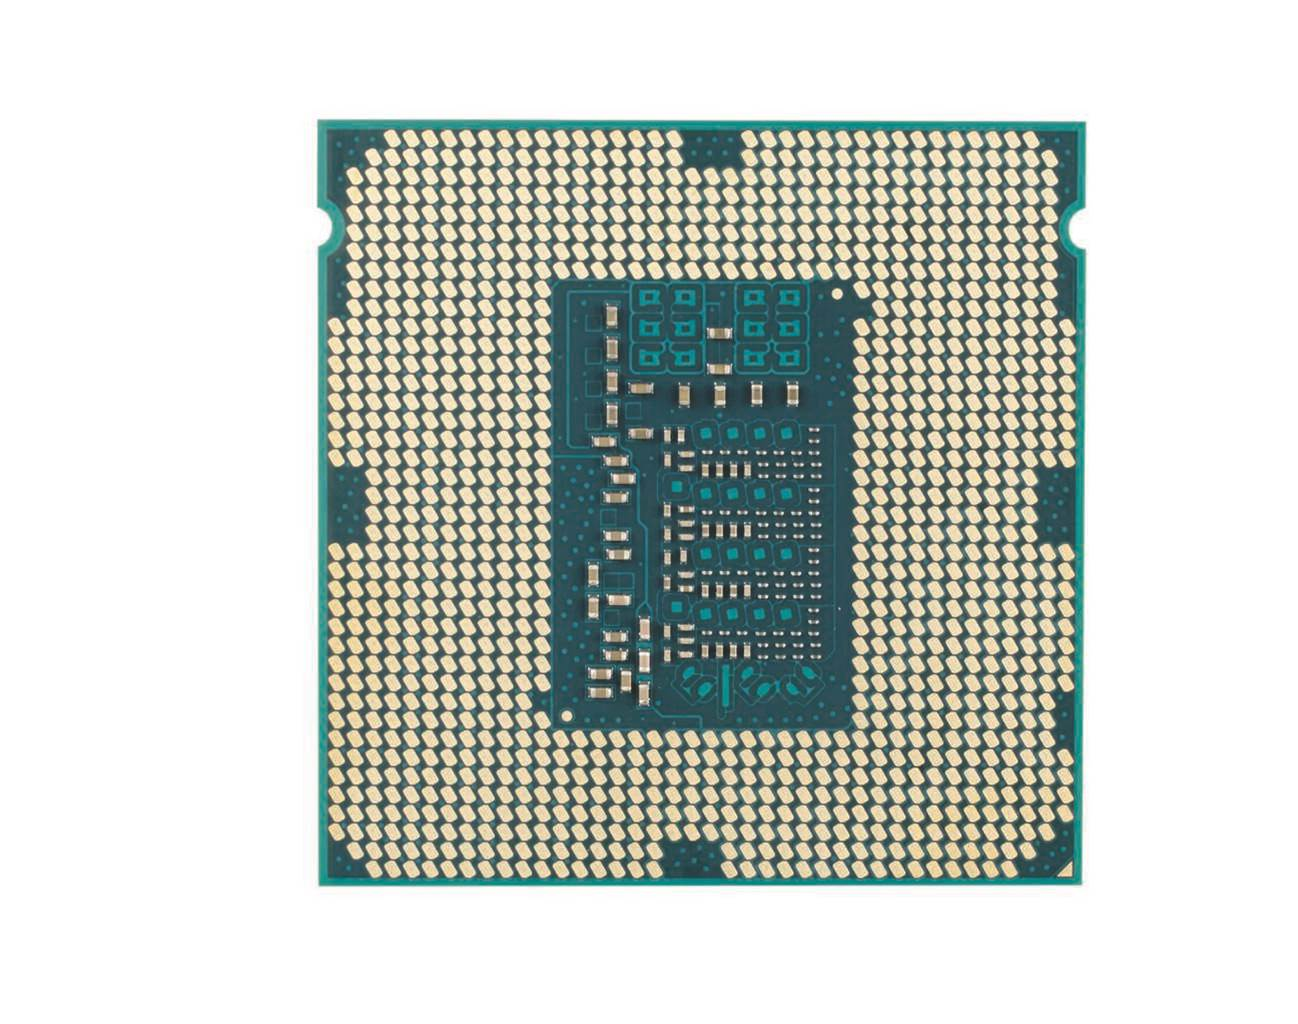 Review: Intel Core i7-4790K